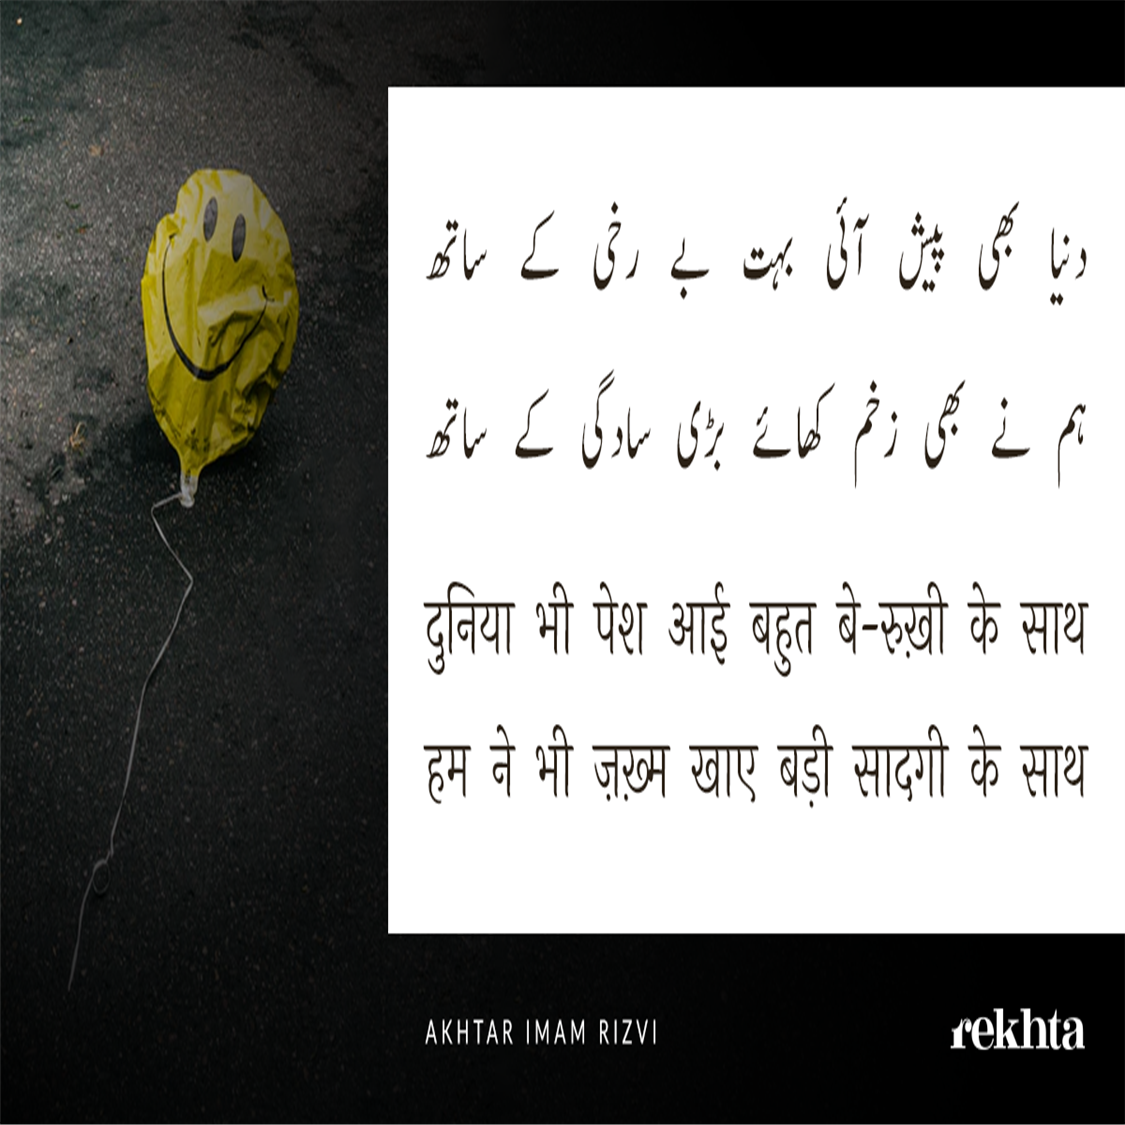 duniyaa bhii pesh aa.ii bahut be-ruKHii ke saath-Akhtar Imam Rizvi